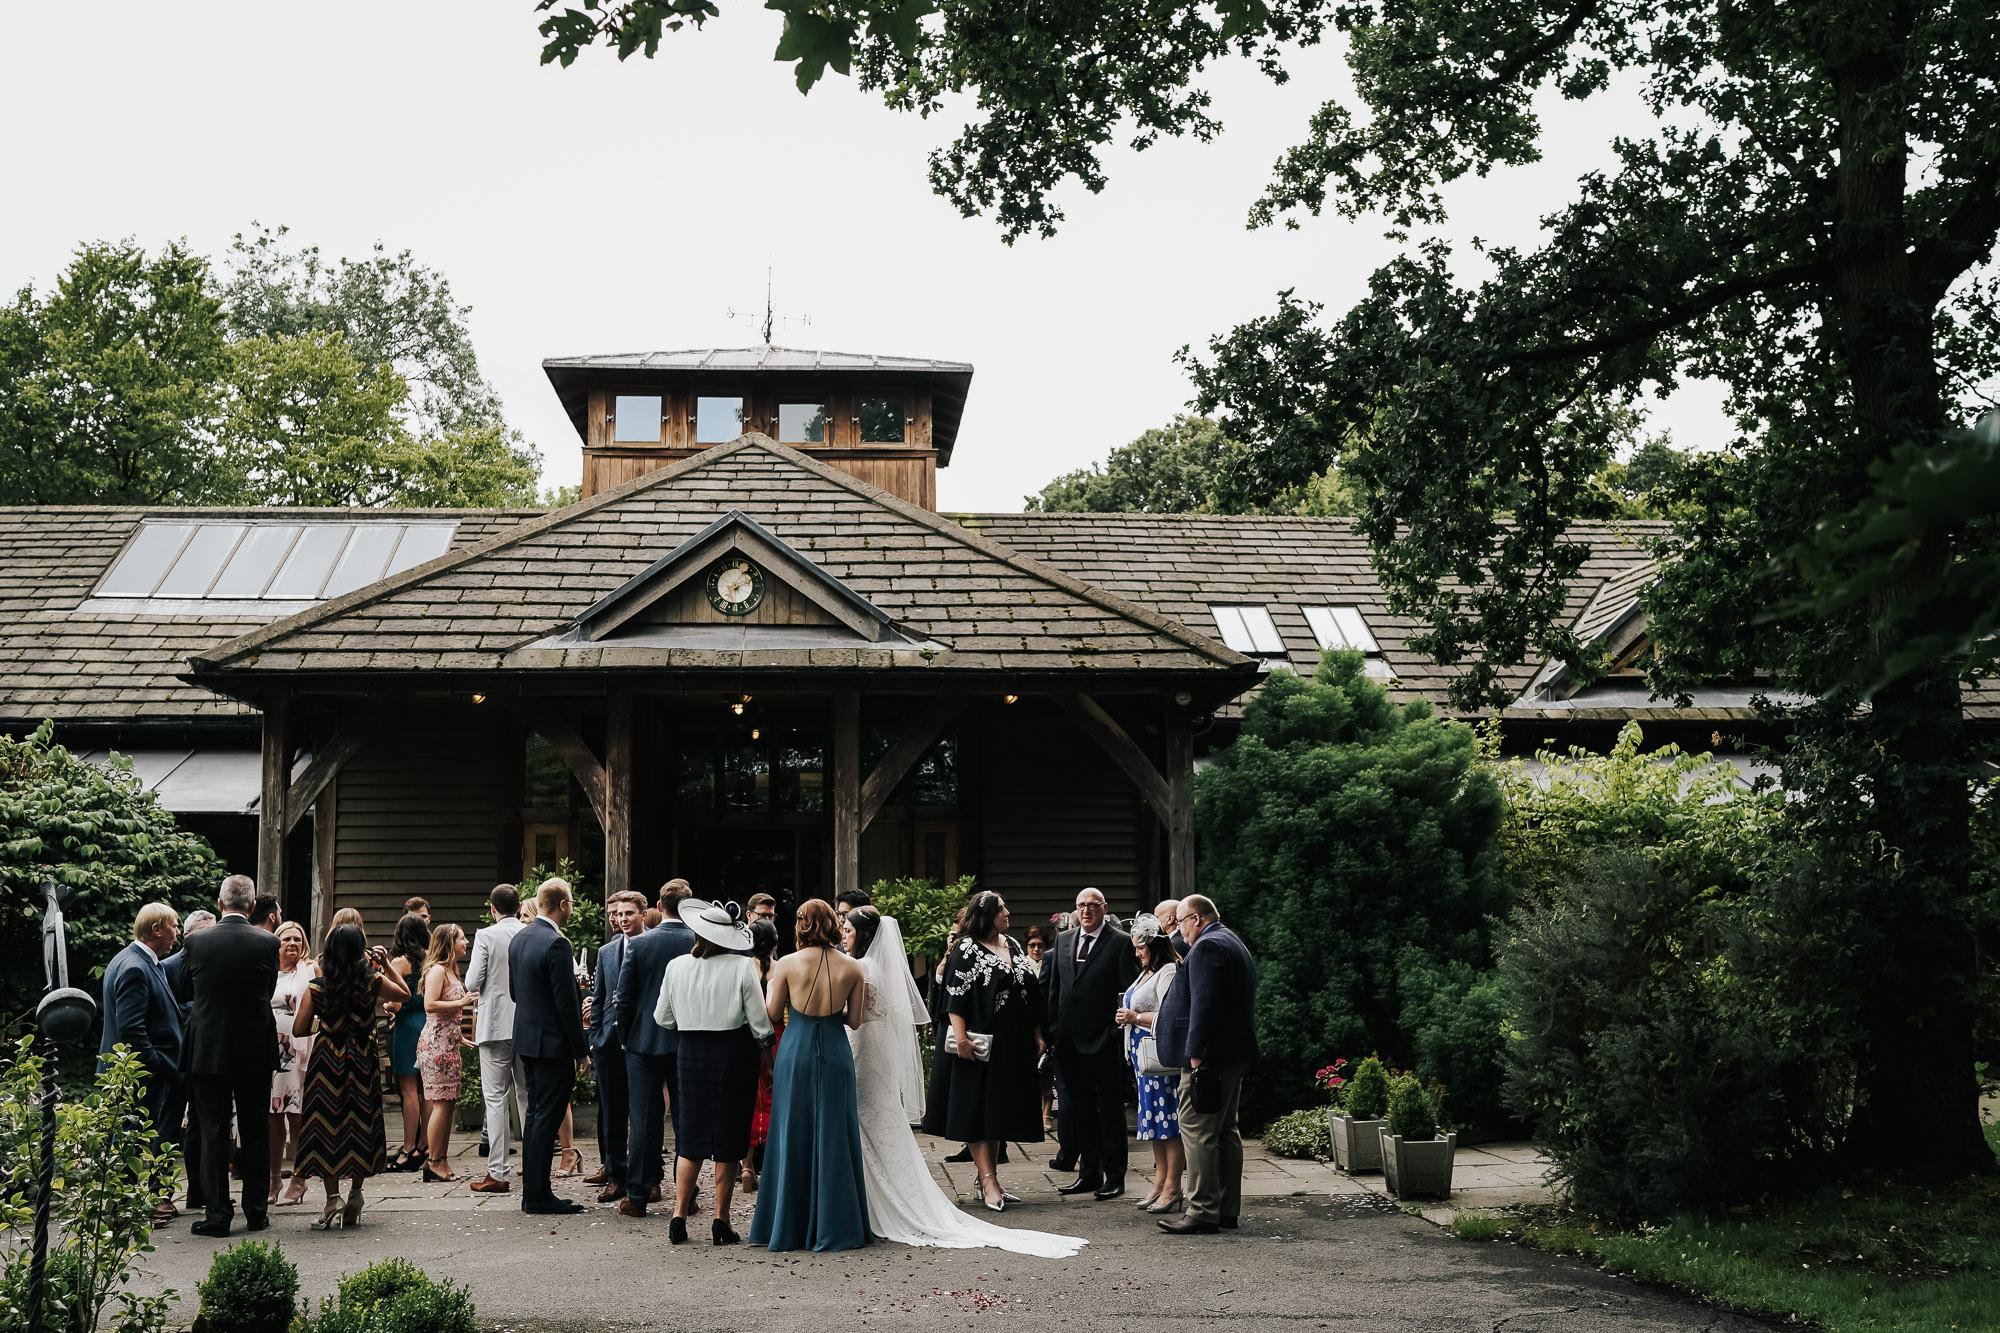 Oak tree of peover wedding photography cheshire wedding photographer (26 of 56).jpg